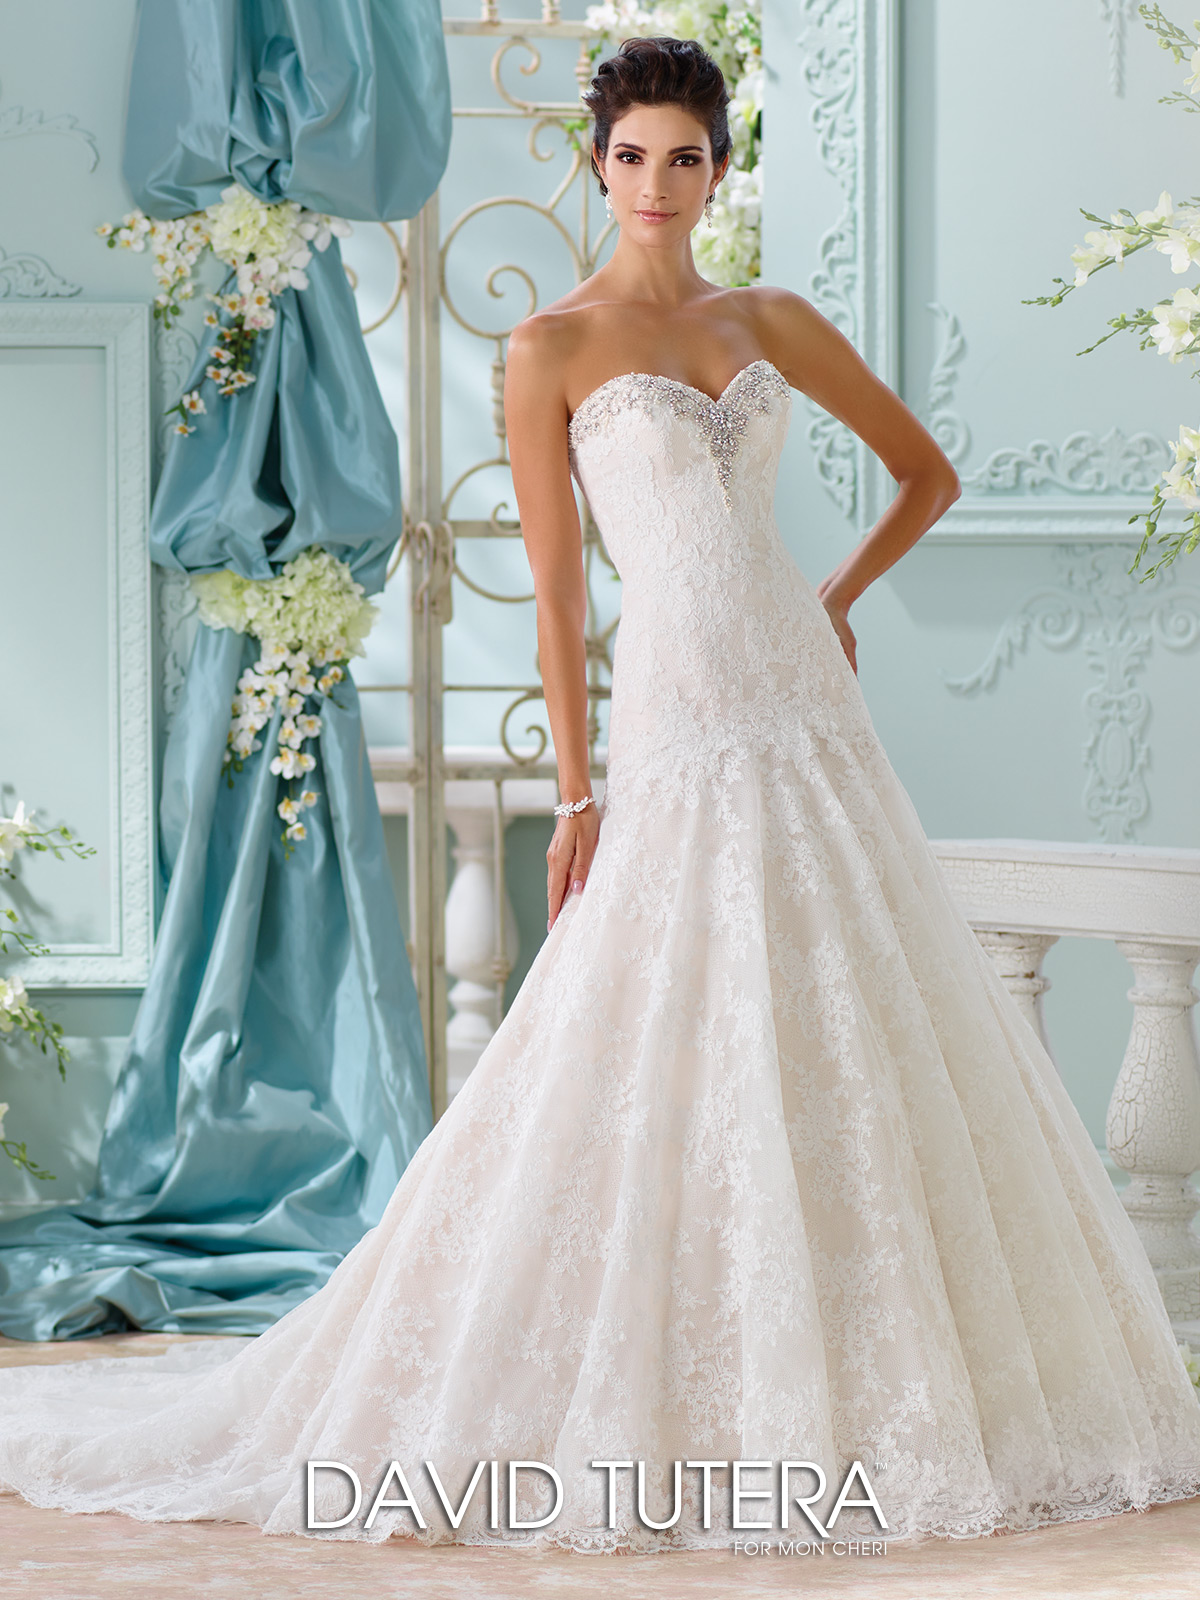 18e08d3068e7d David-tutera-mon-cheri-wedding-dress-116205